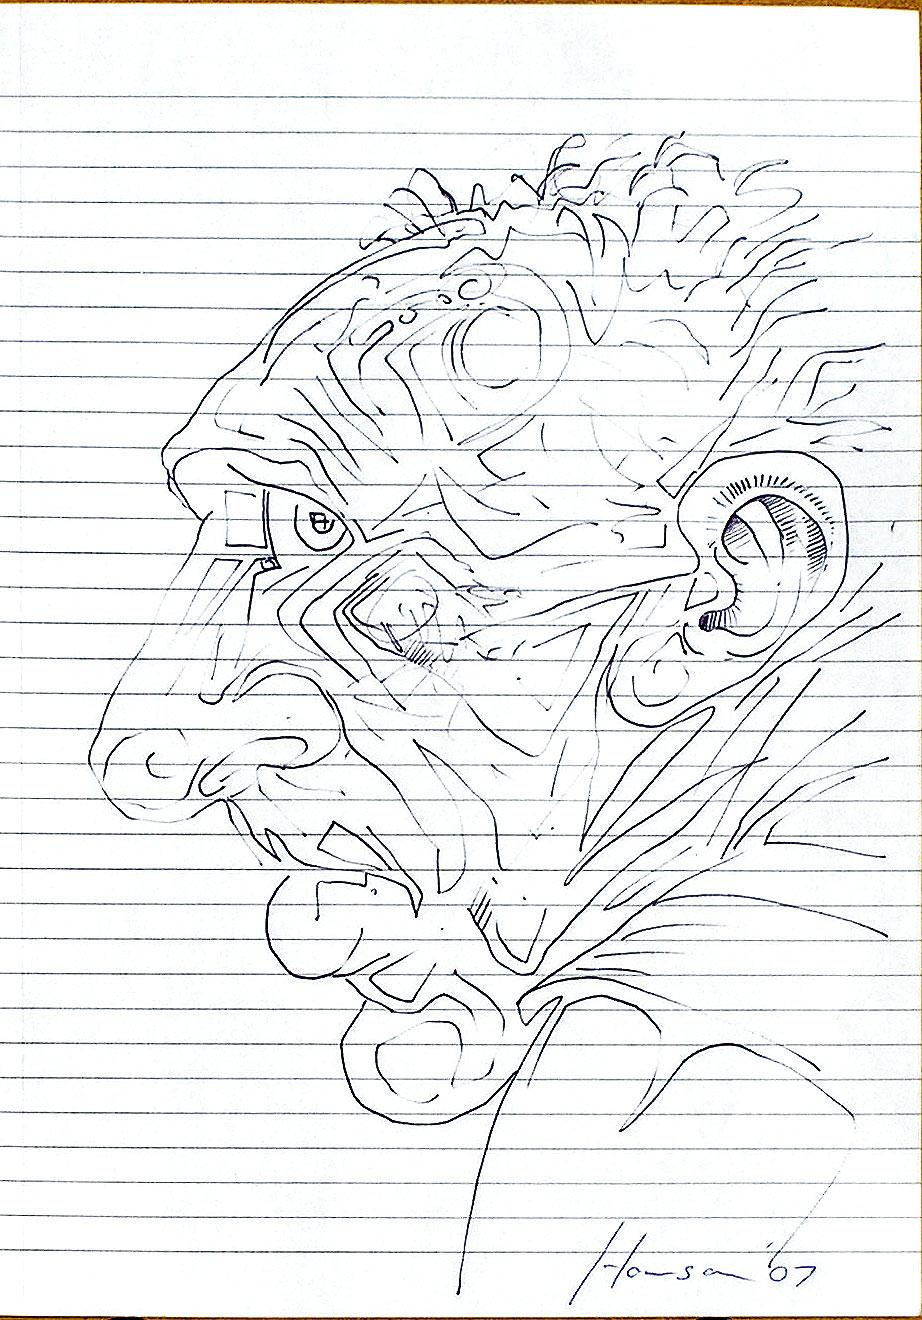 line sketch of man's head